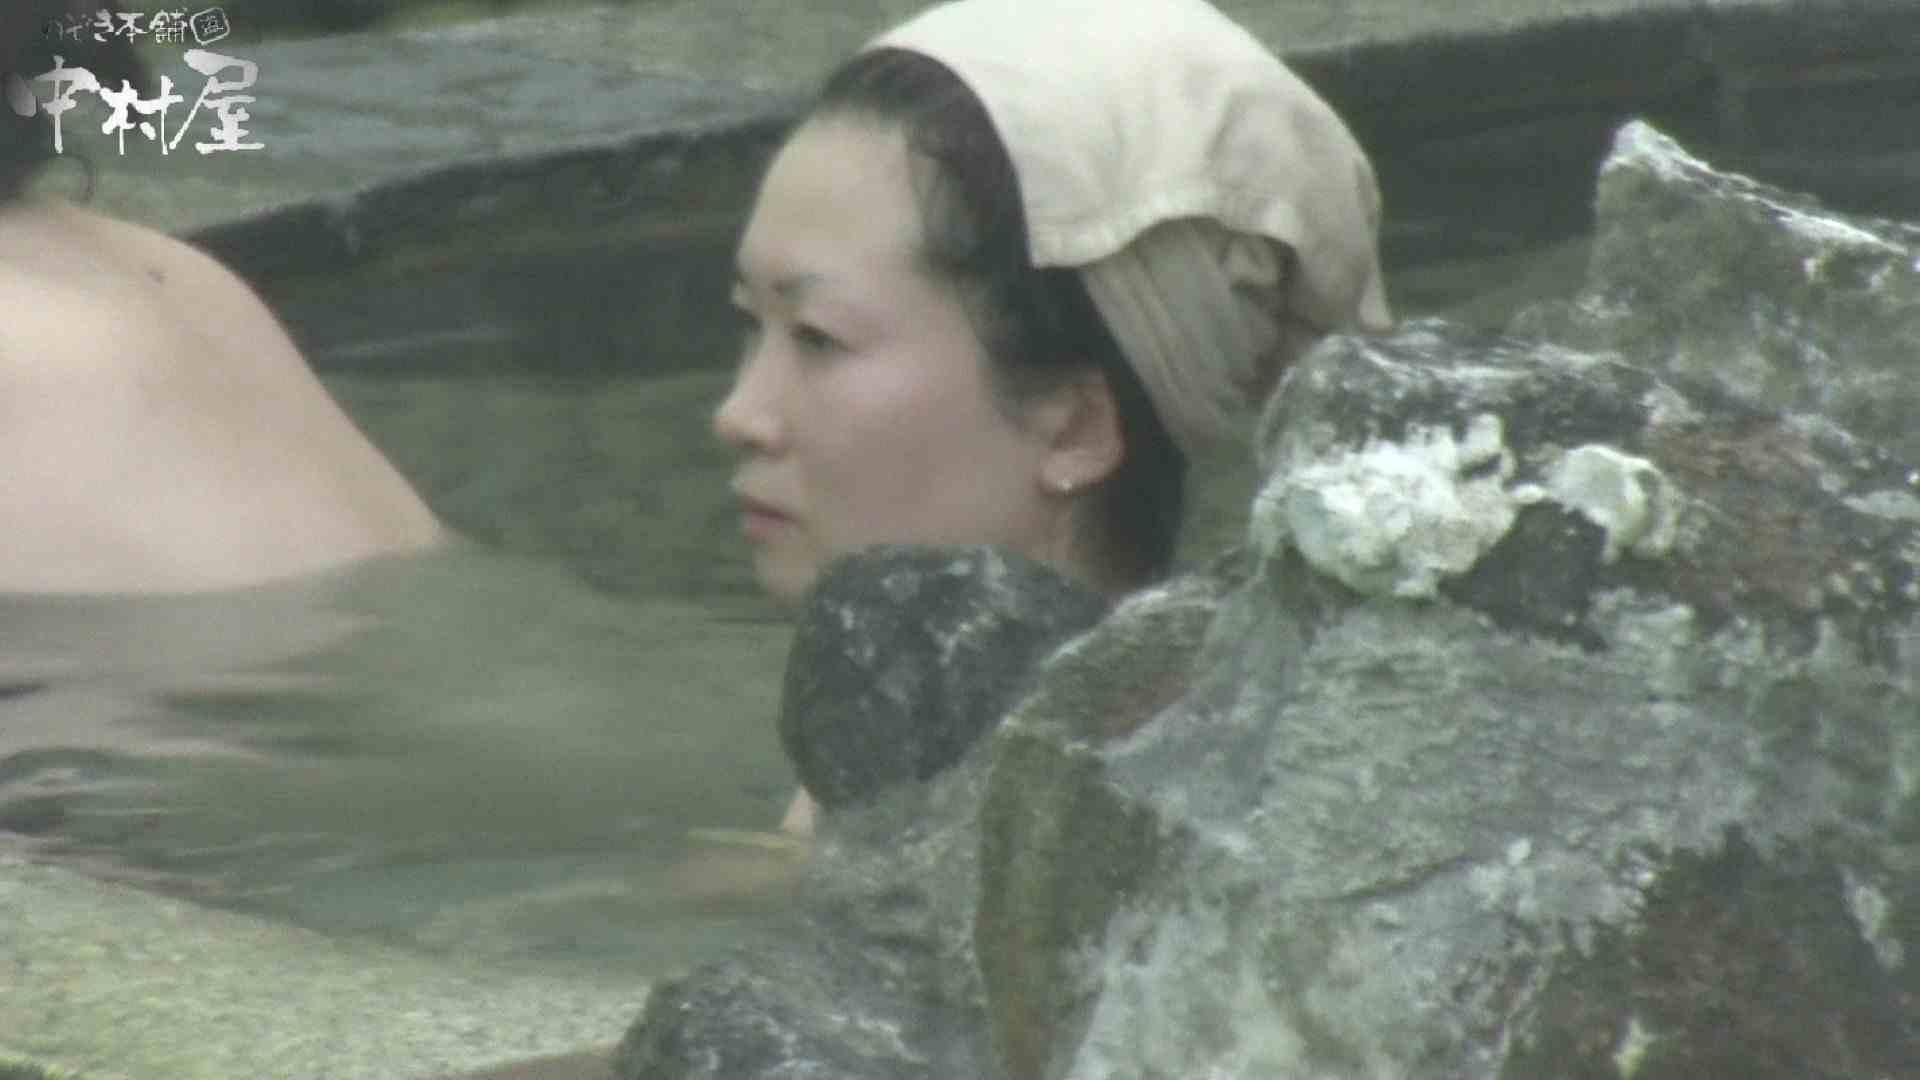 Aquaな露天風呂Vol.906 露天風呂編 | 盗撮シリーズ  86PIX 71